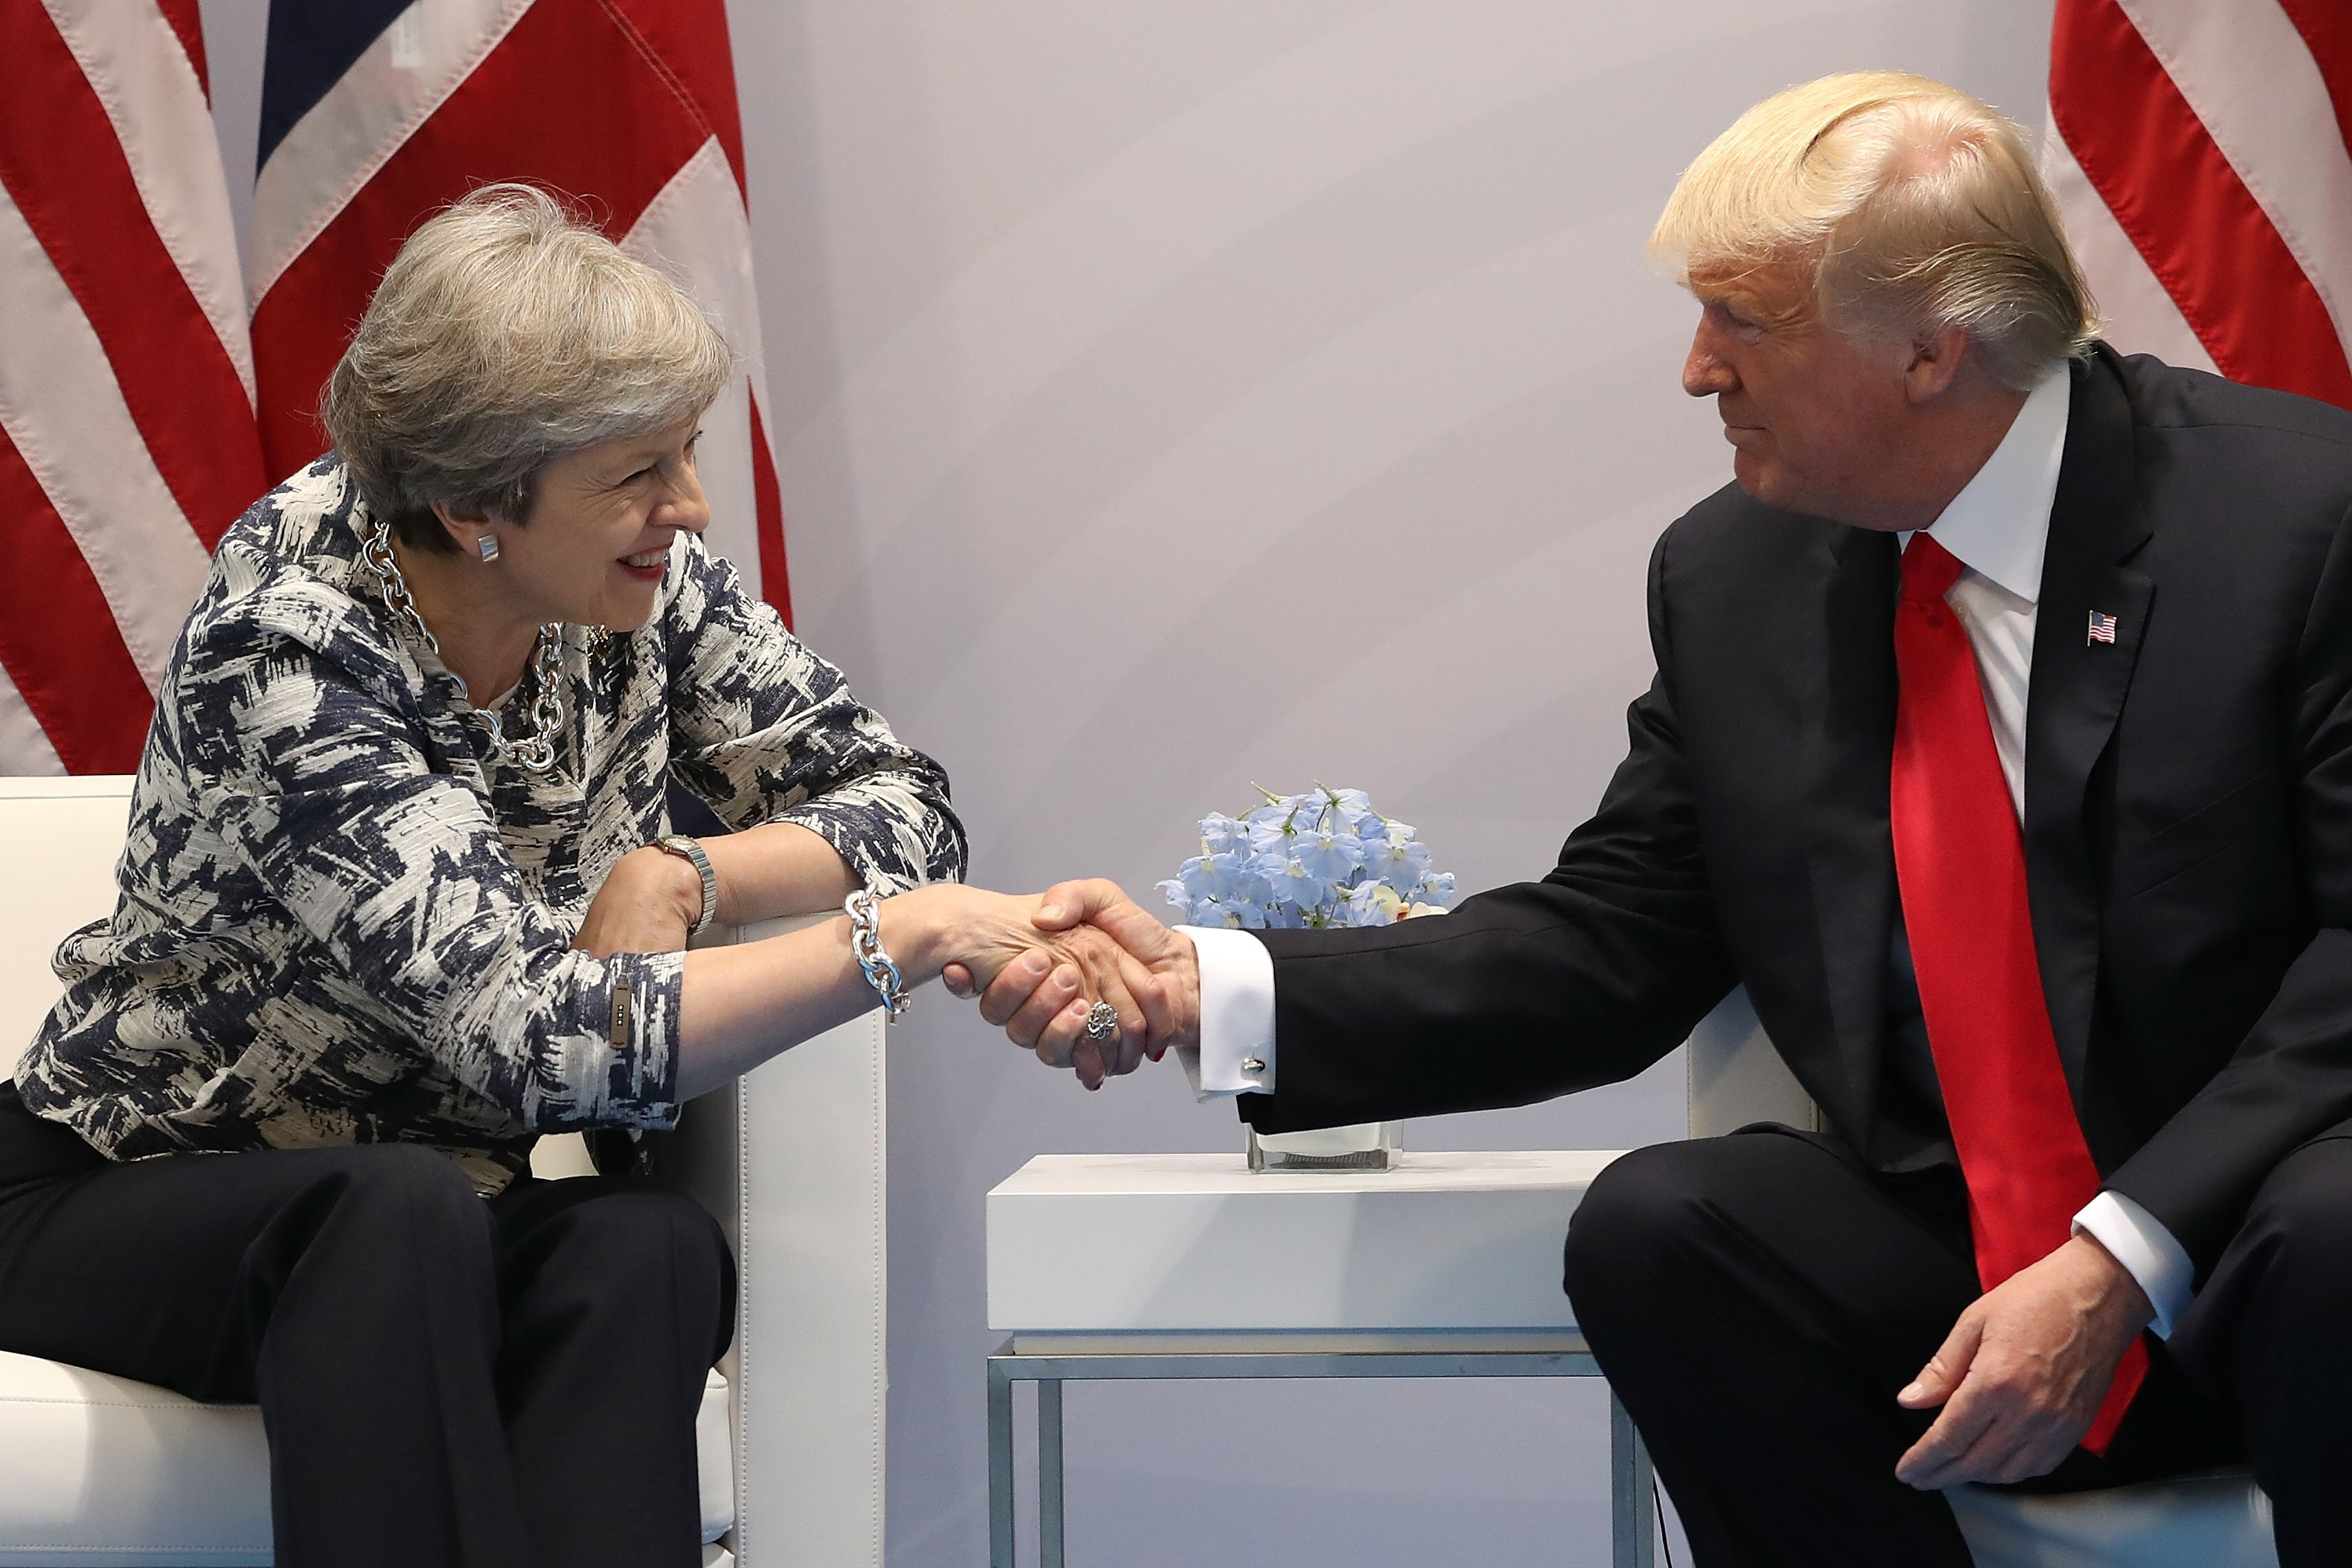 Theresa May greeting U.S Donald Trump at the 2017 G20 summit in Hamburg, Germany | Photo: Getty Images